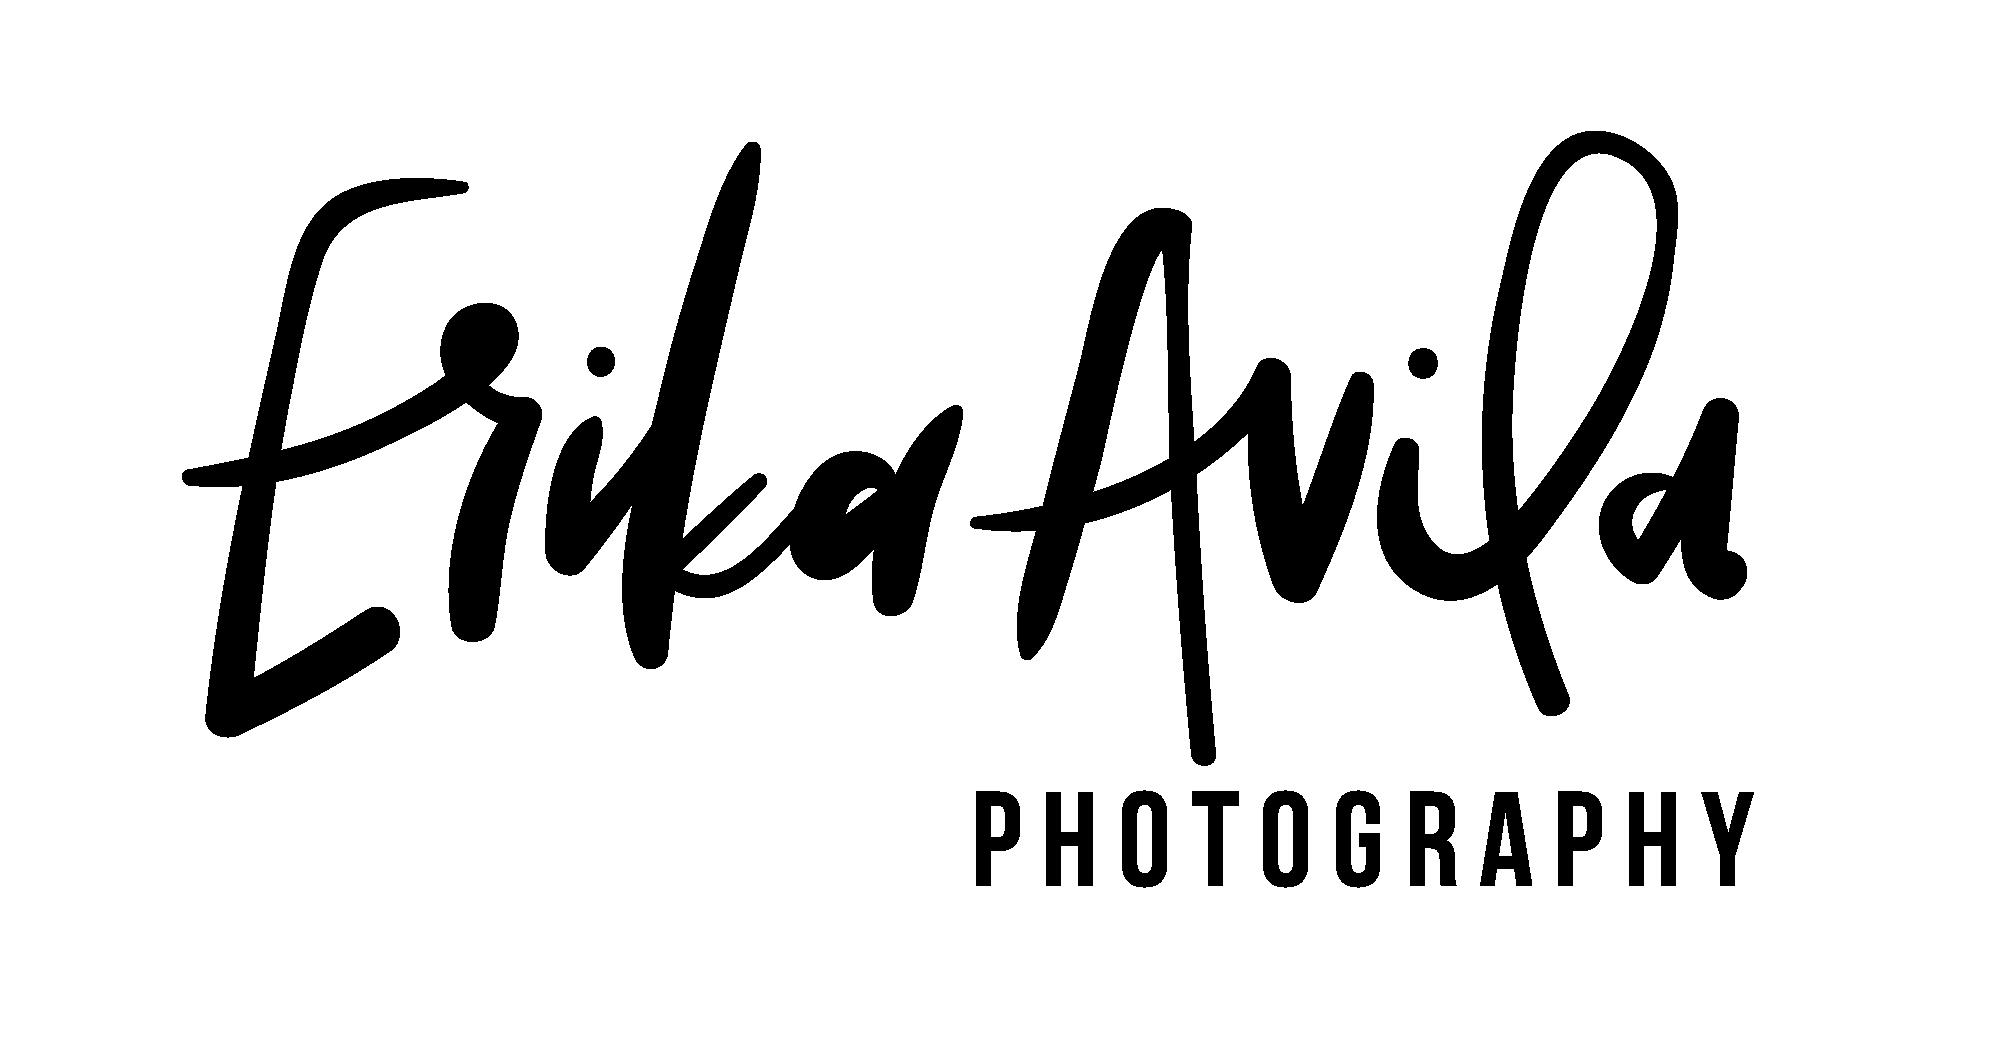 Erika-V-Avila-main-logo-black.png